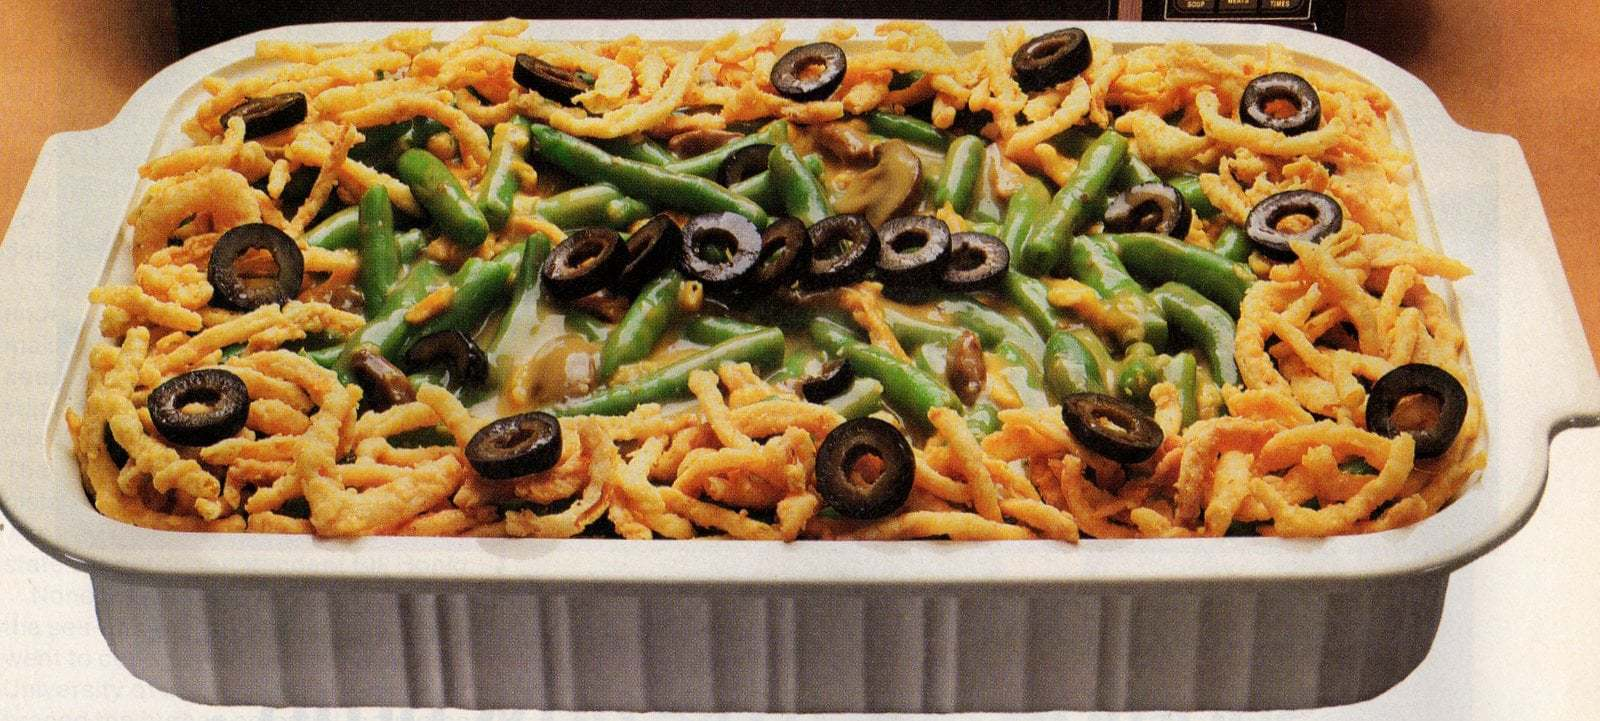 Golden green bean bake recipe - microwave 1987 (2)